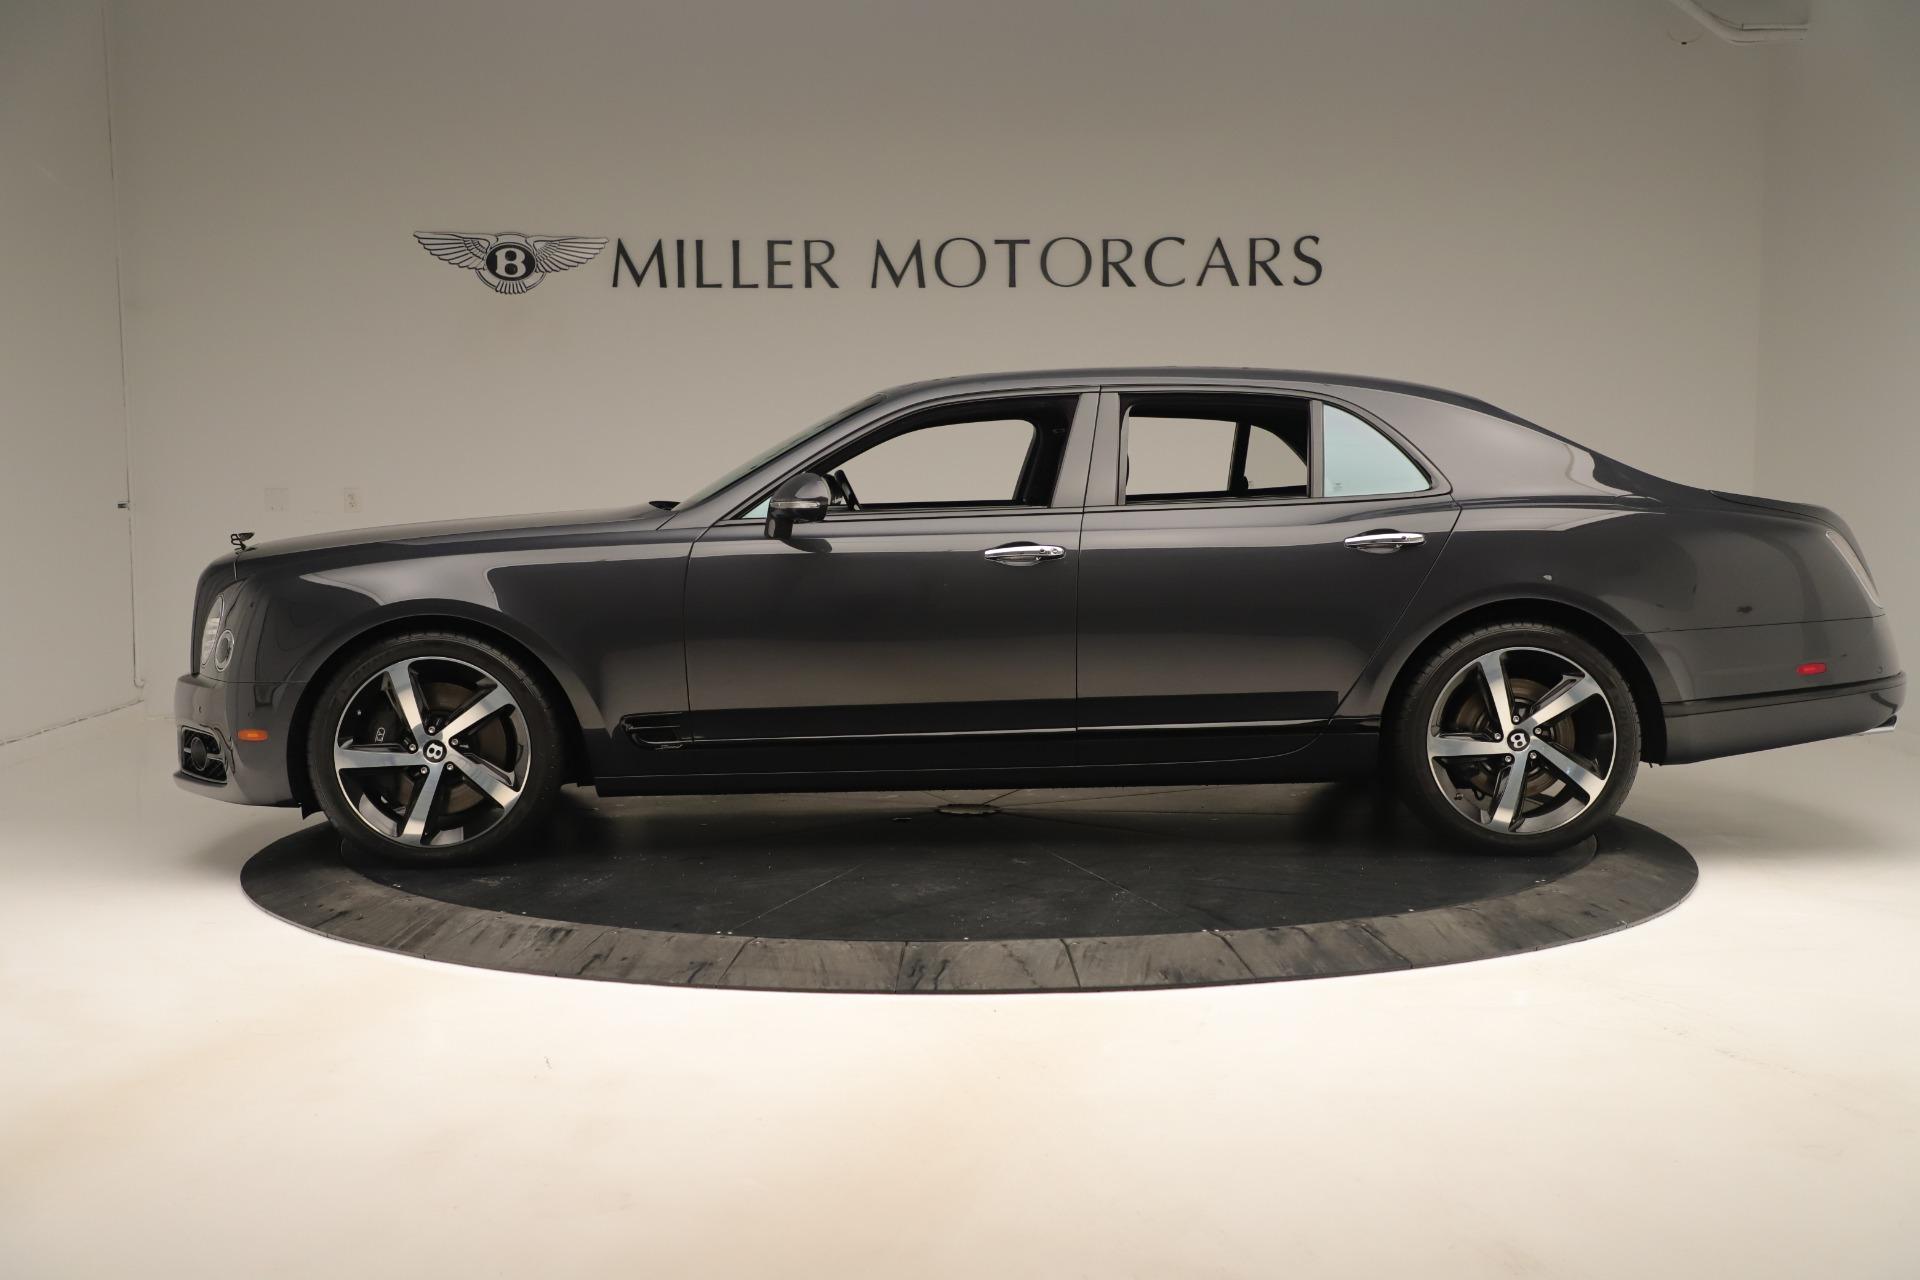 Used 2018 Bentley Mulsanne Speed Design Series For Sale In Westport, CT 3405_p3